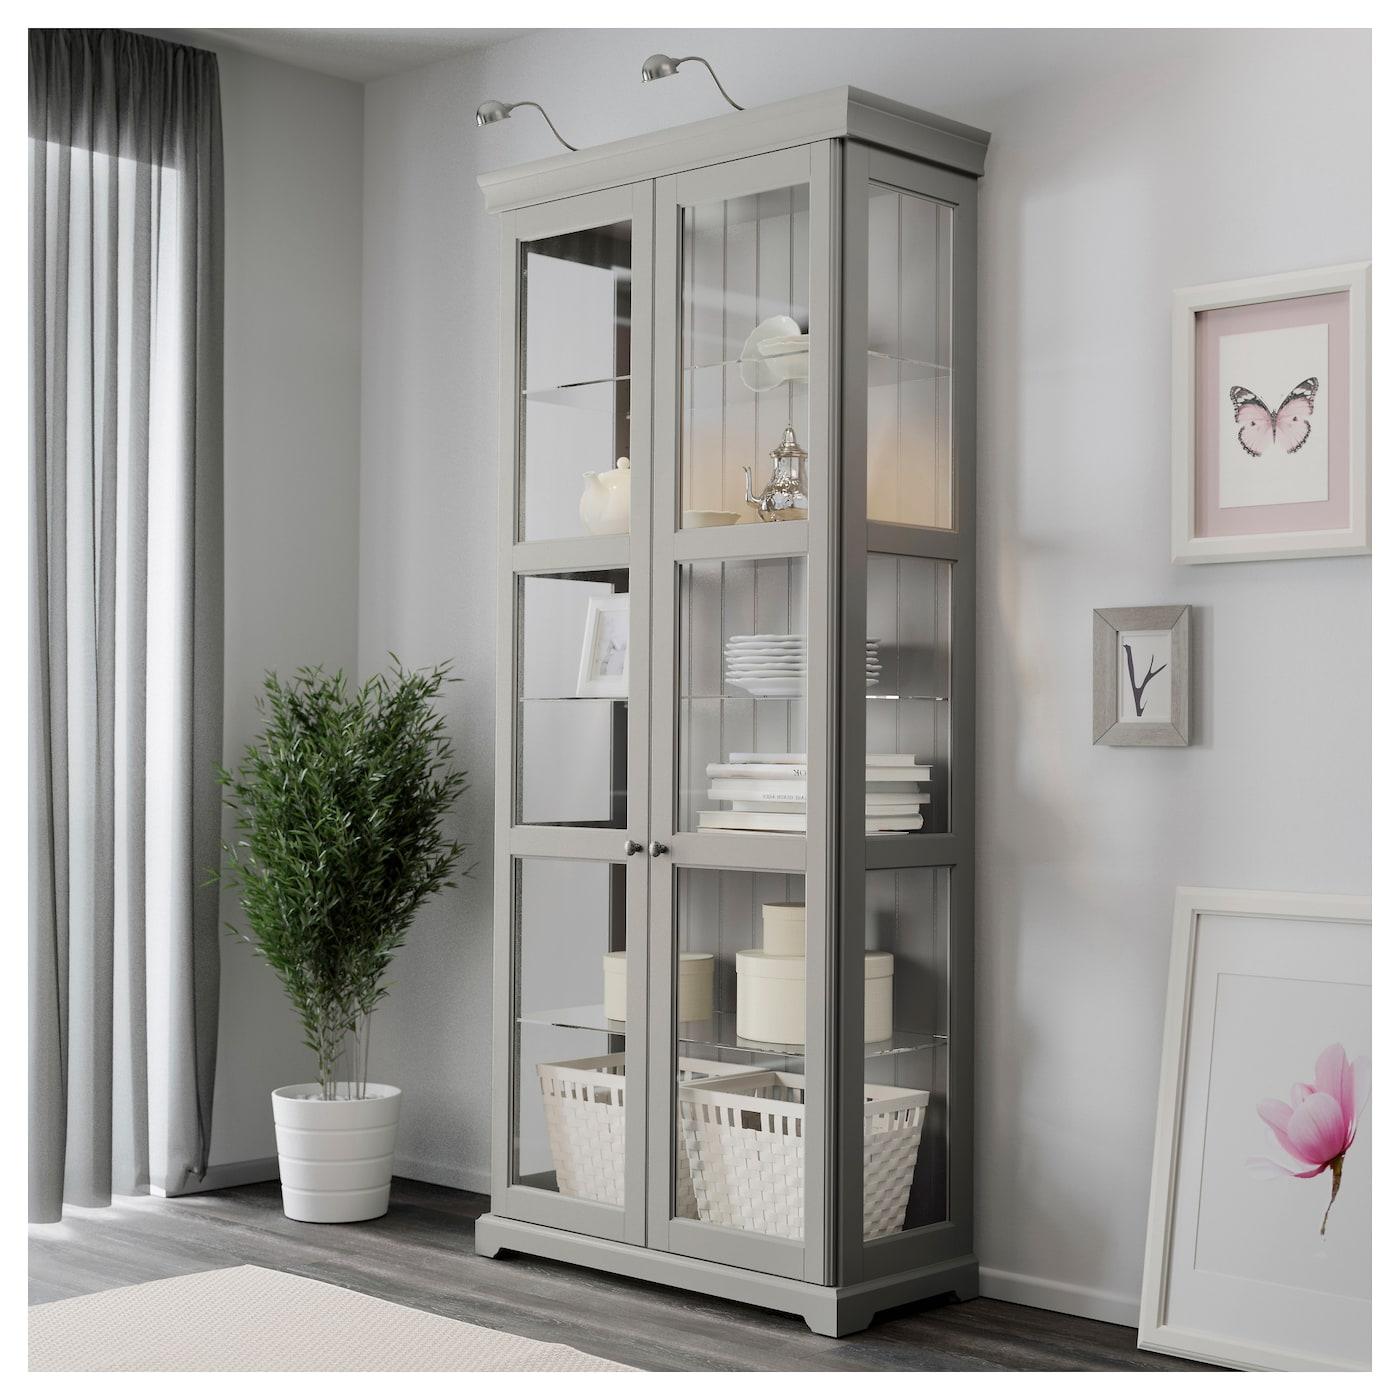 liatorp glass door cabinet grey 96 x 214 cm ikea. Black Bedroom Furniture Sets. Home Design Ideas